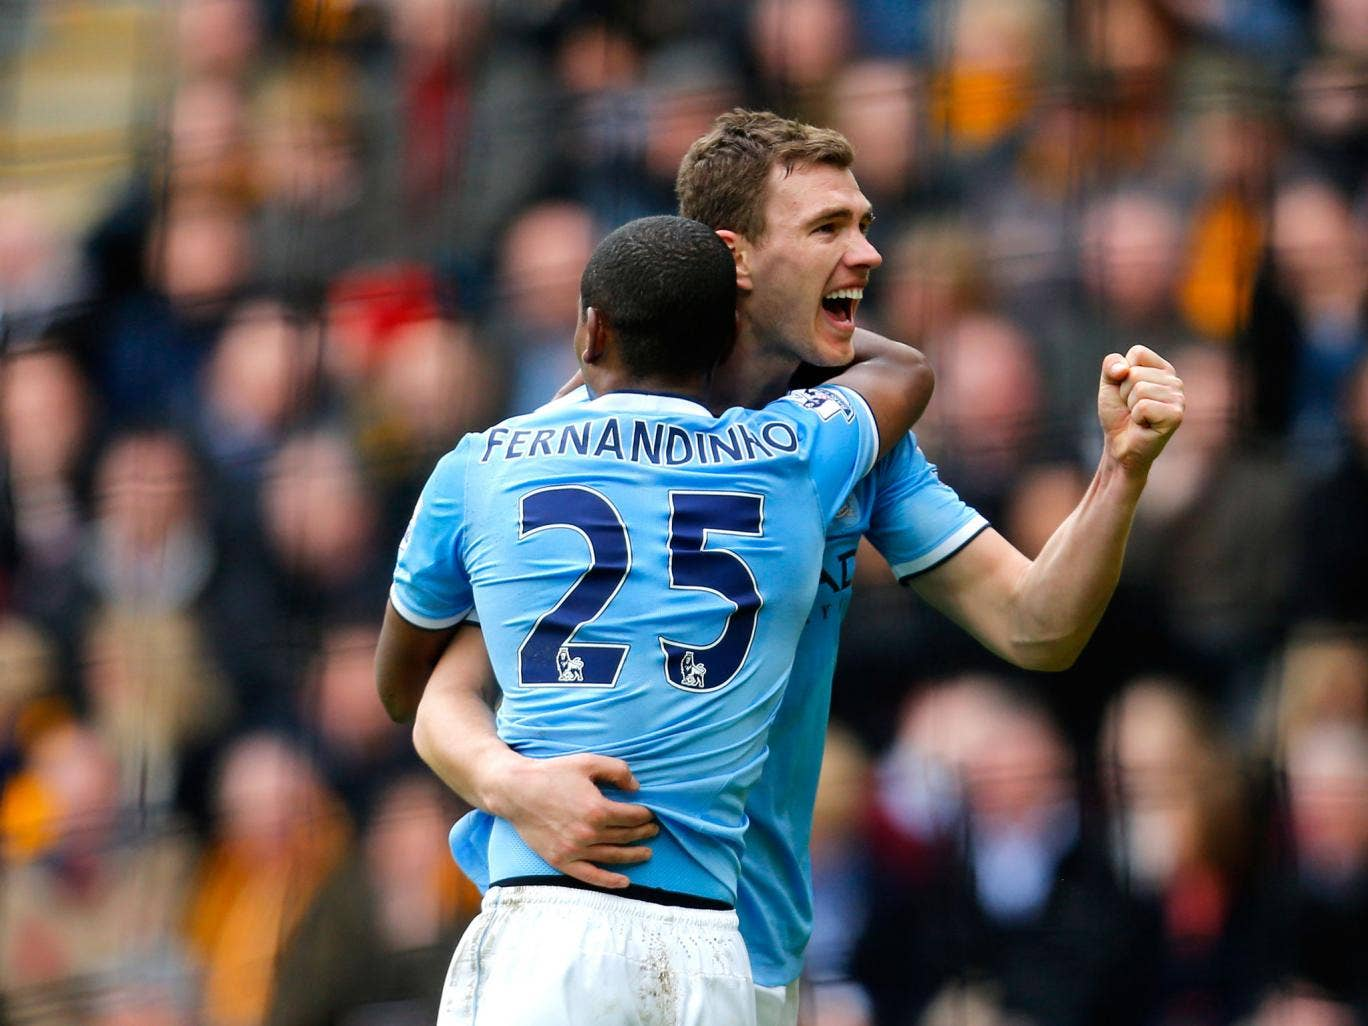 Edin Dzeko of Manchester City celerates with teammate Fernandinho